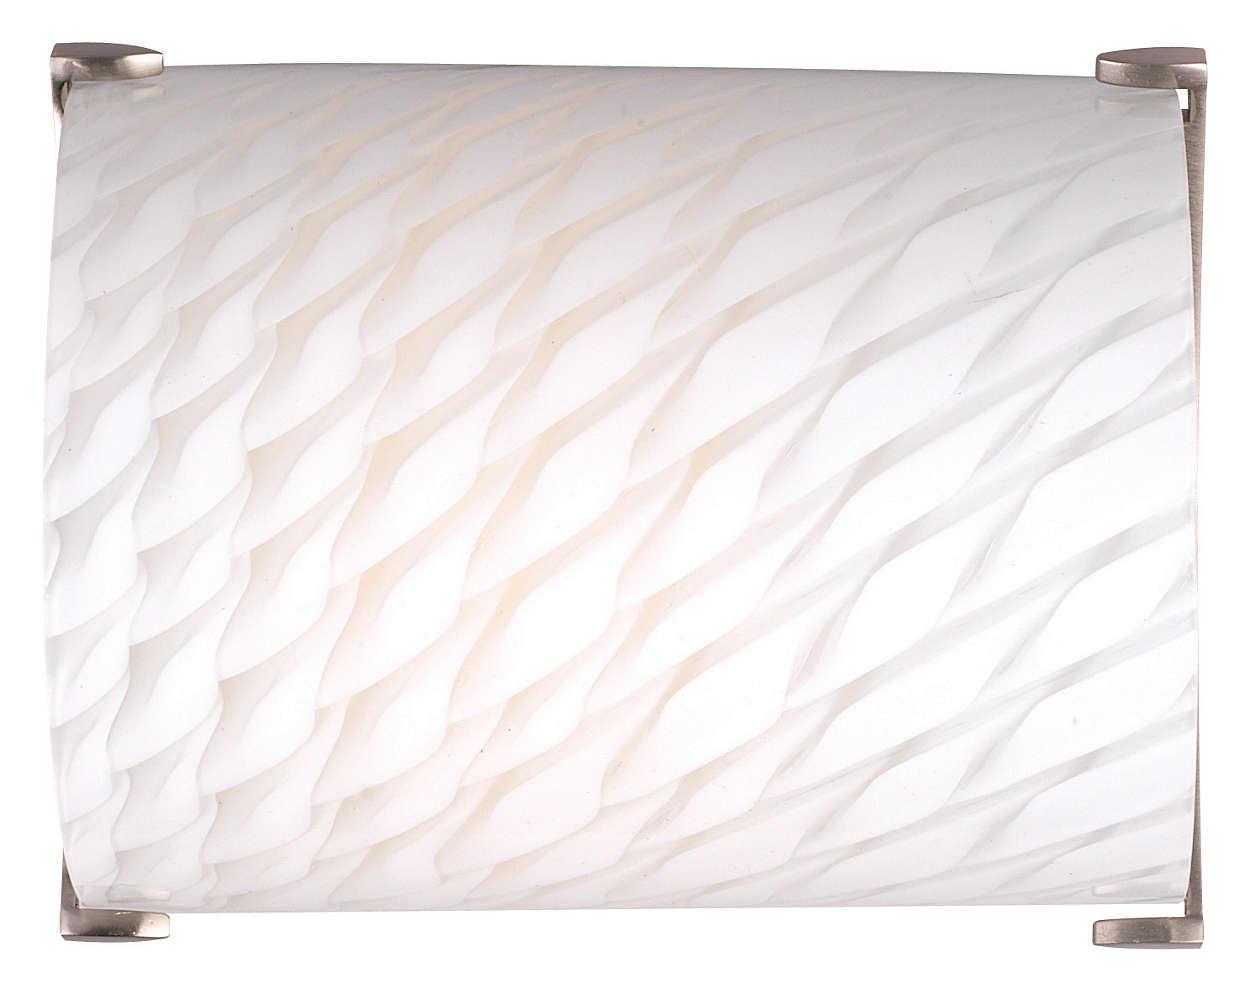 Edge 1-light Wall in Satin Nickel finish